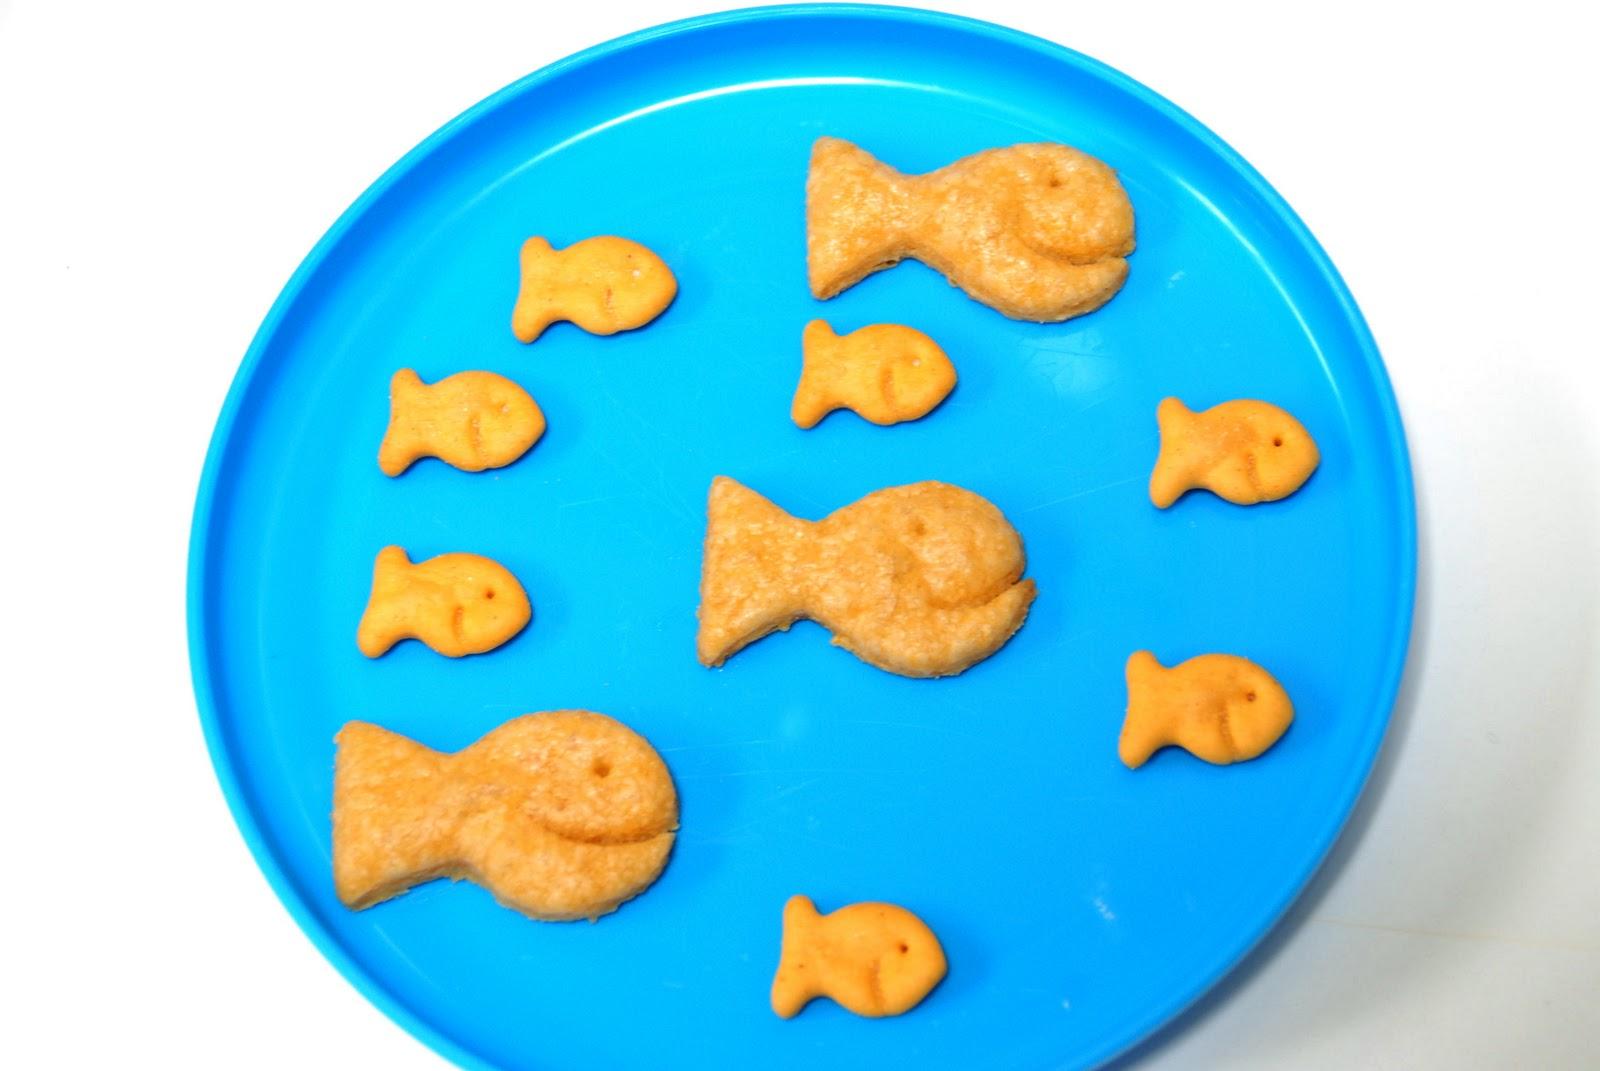 Whole Wheat Goldfish Crackers via Smitten Kitchen